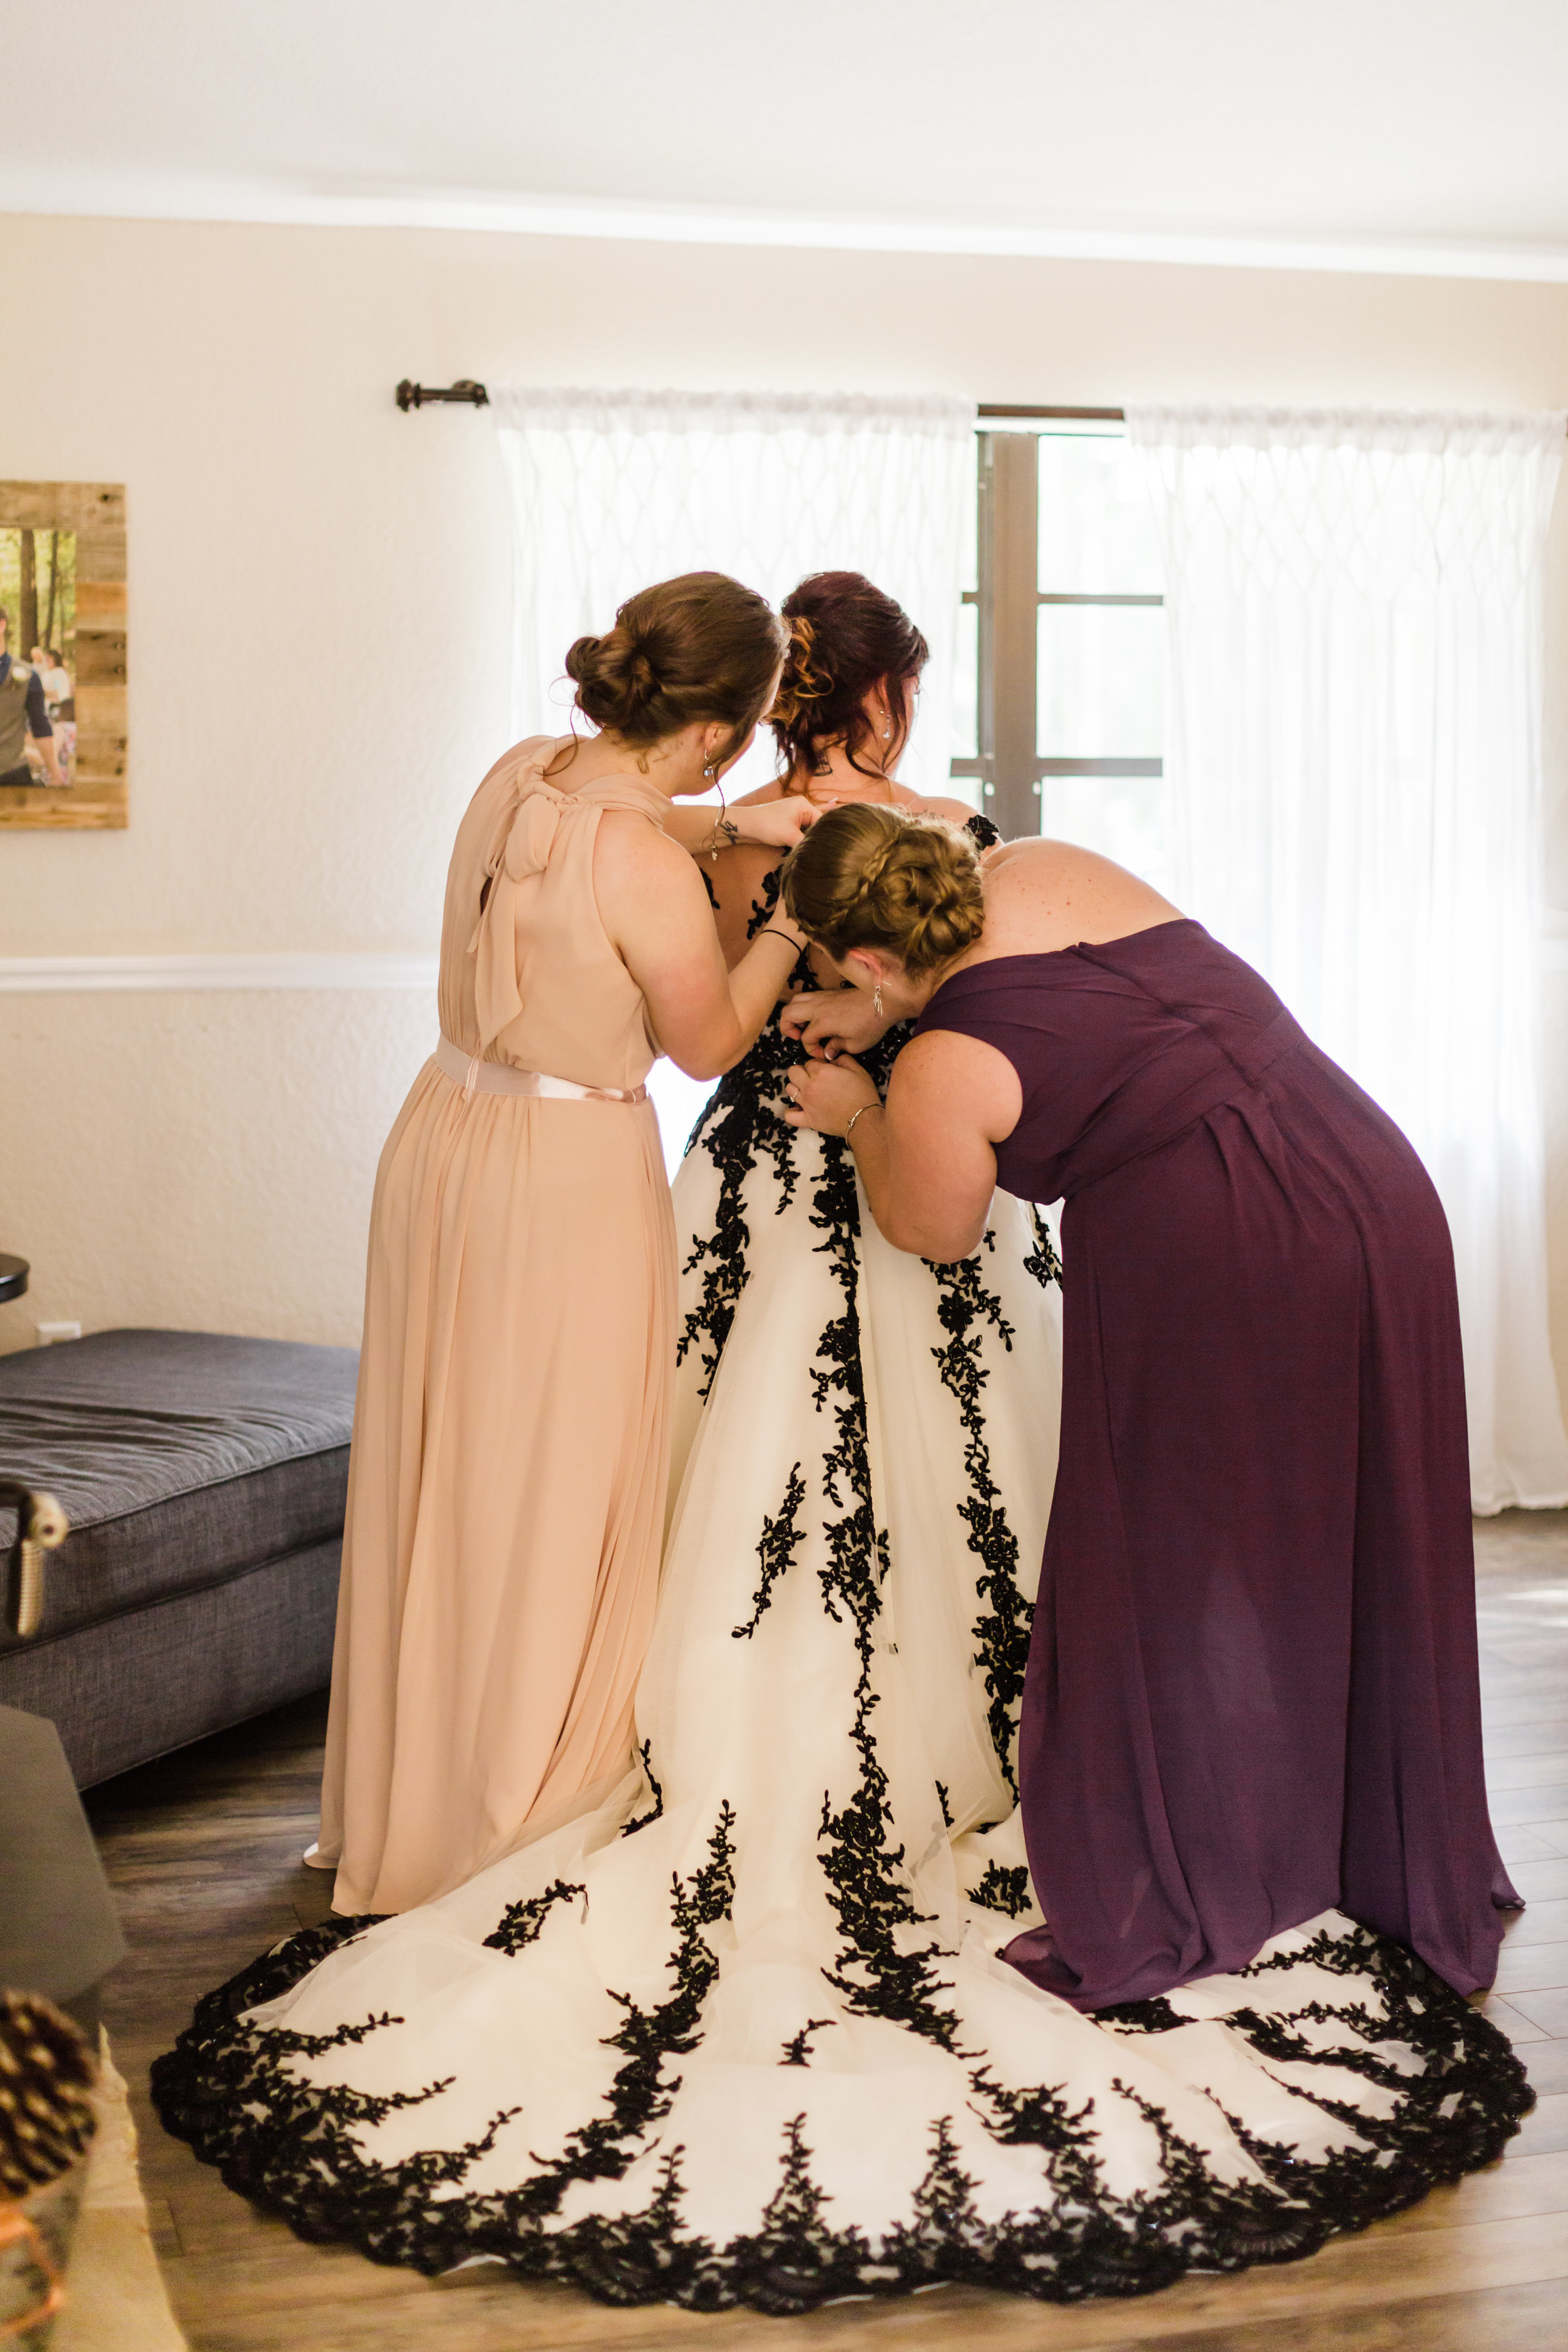 2019.01.12 Ashley and Nathan Bridle Oaks Wedding (52 of 1091).jpg